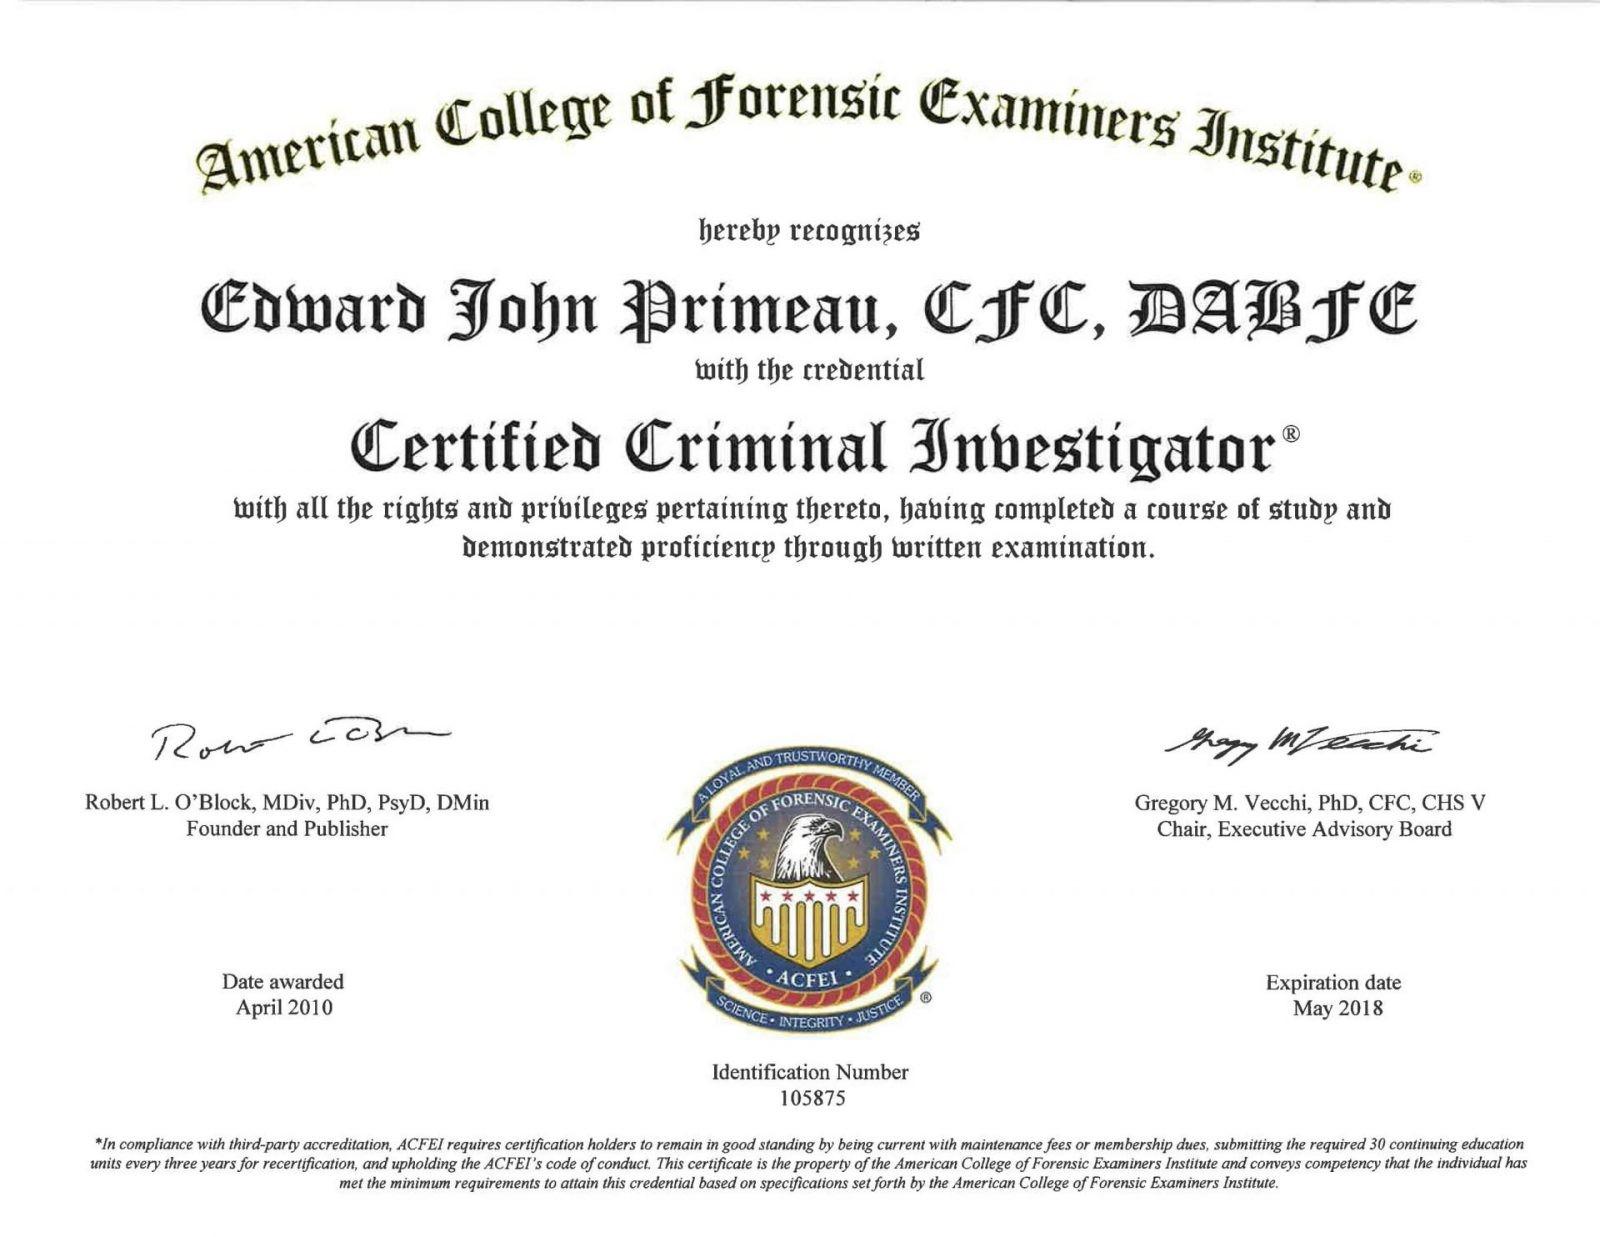 CCI ACFEI - Meet Edward Primeau, CCI, CFC